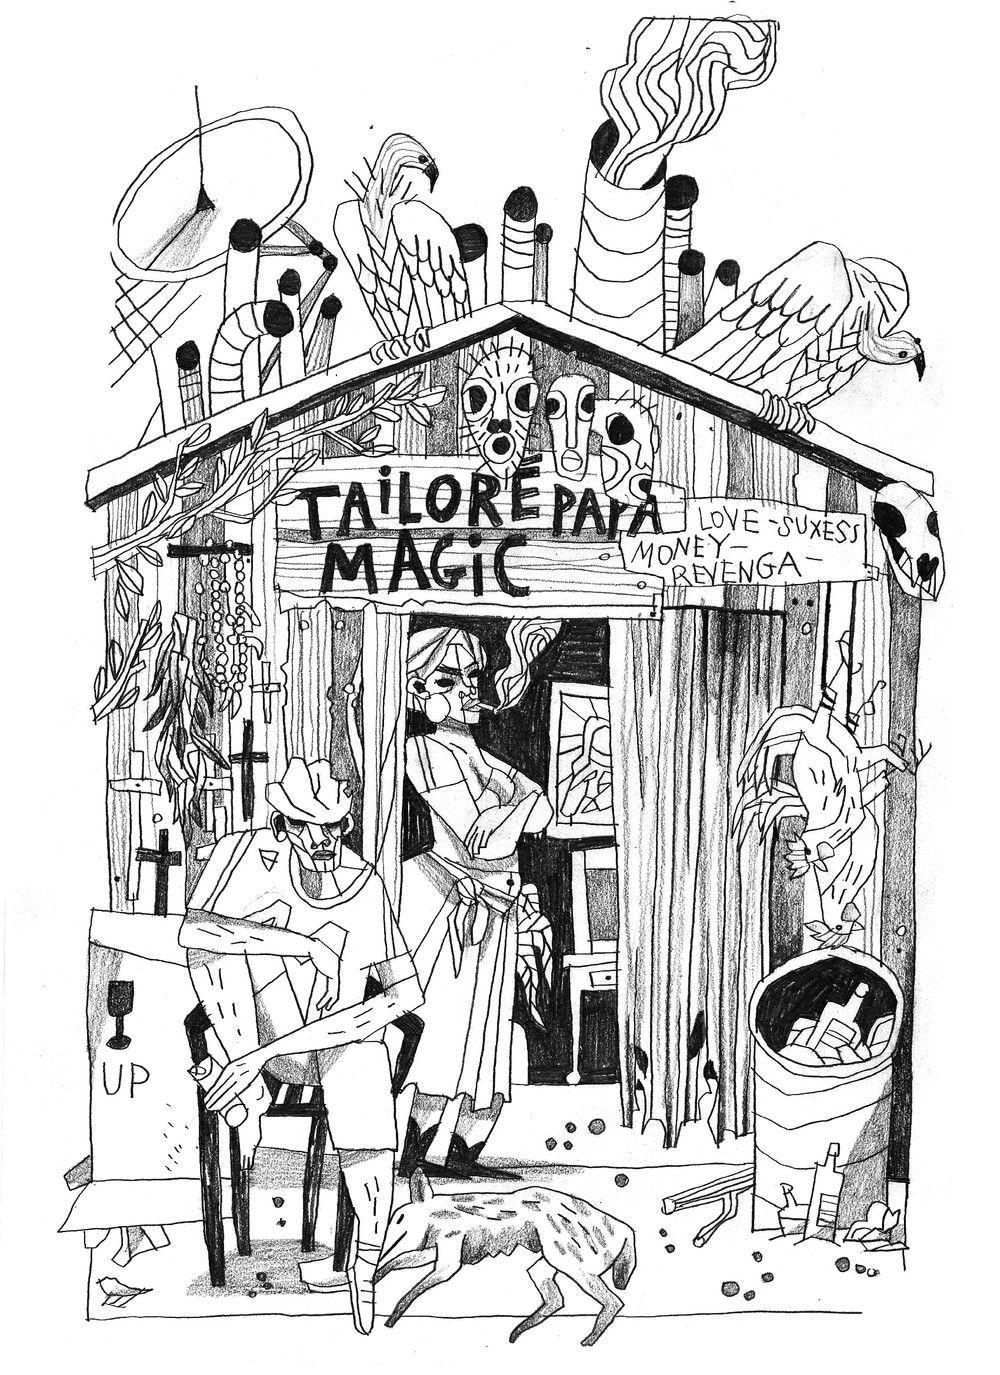 papa magik / ORIGINAL via le shop de tarmasz. Click on the image to see more!